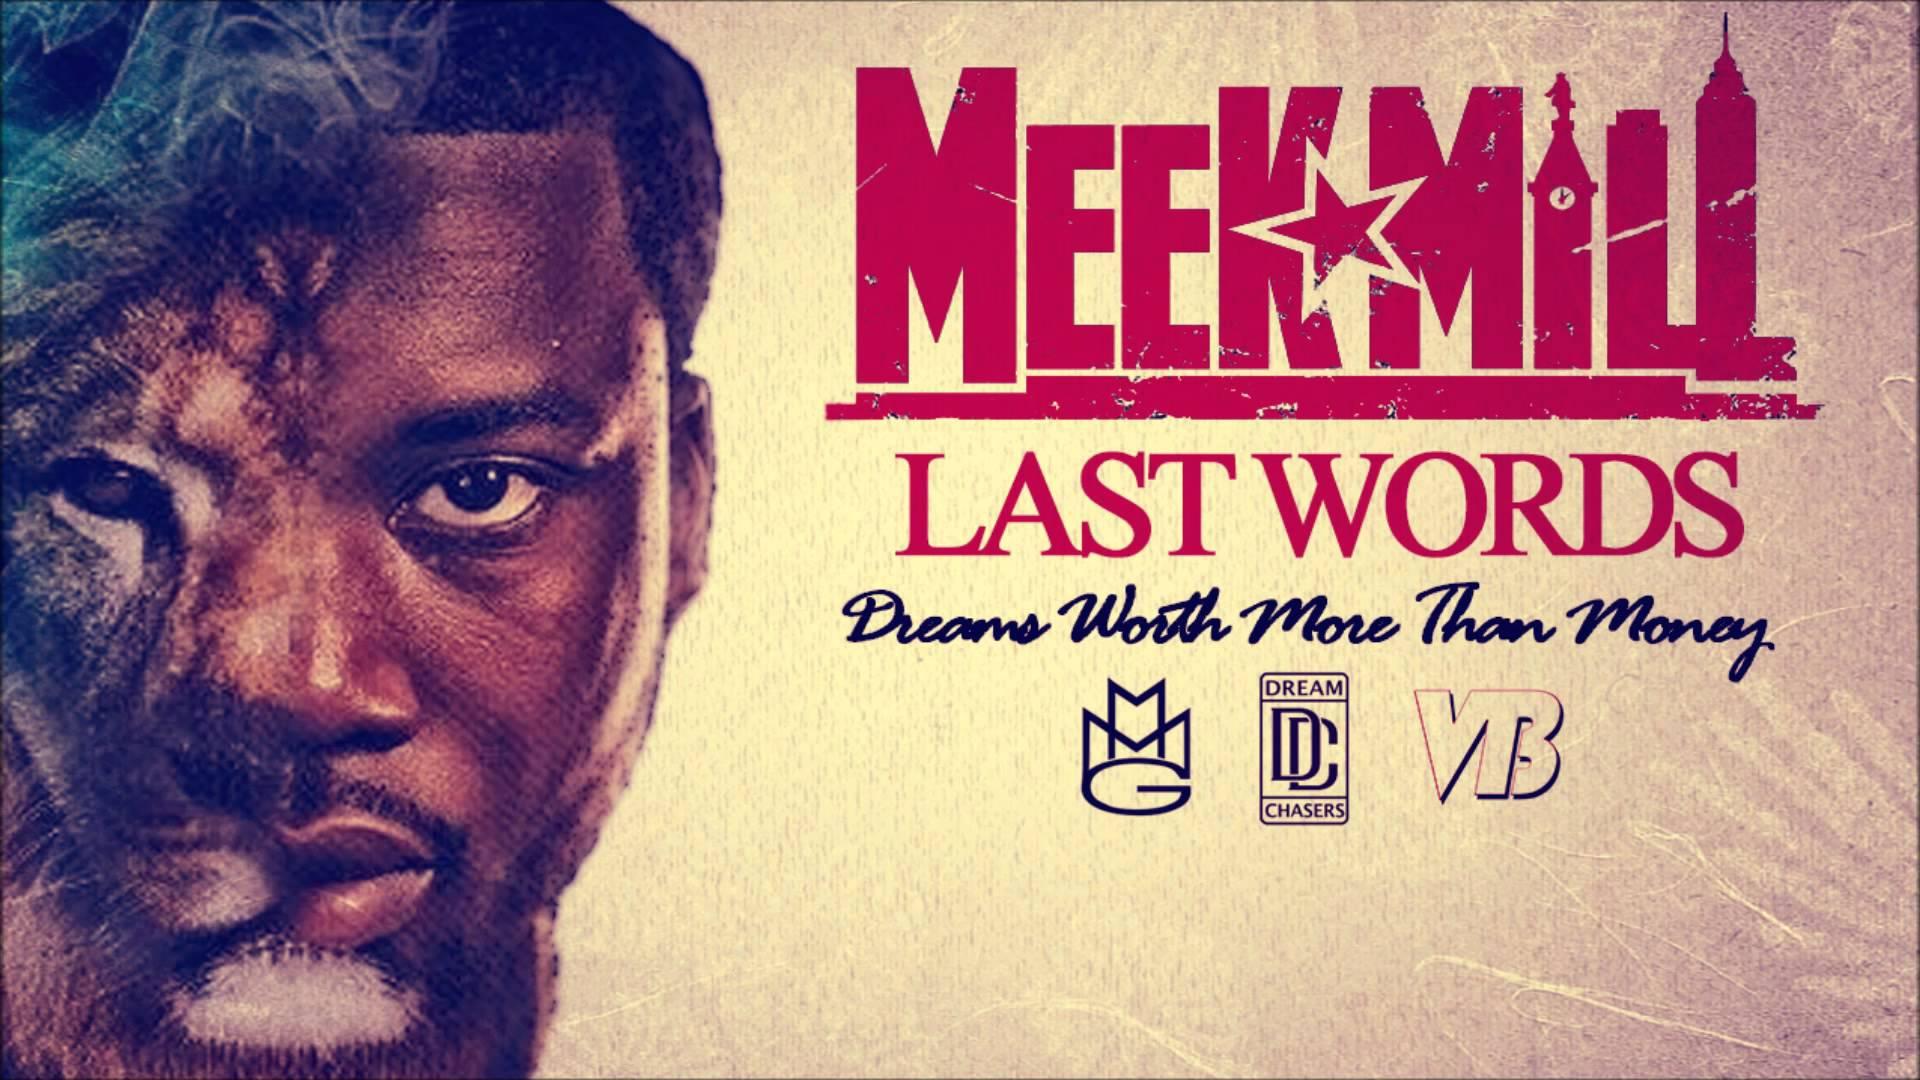 meek mill dream chaser v album download